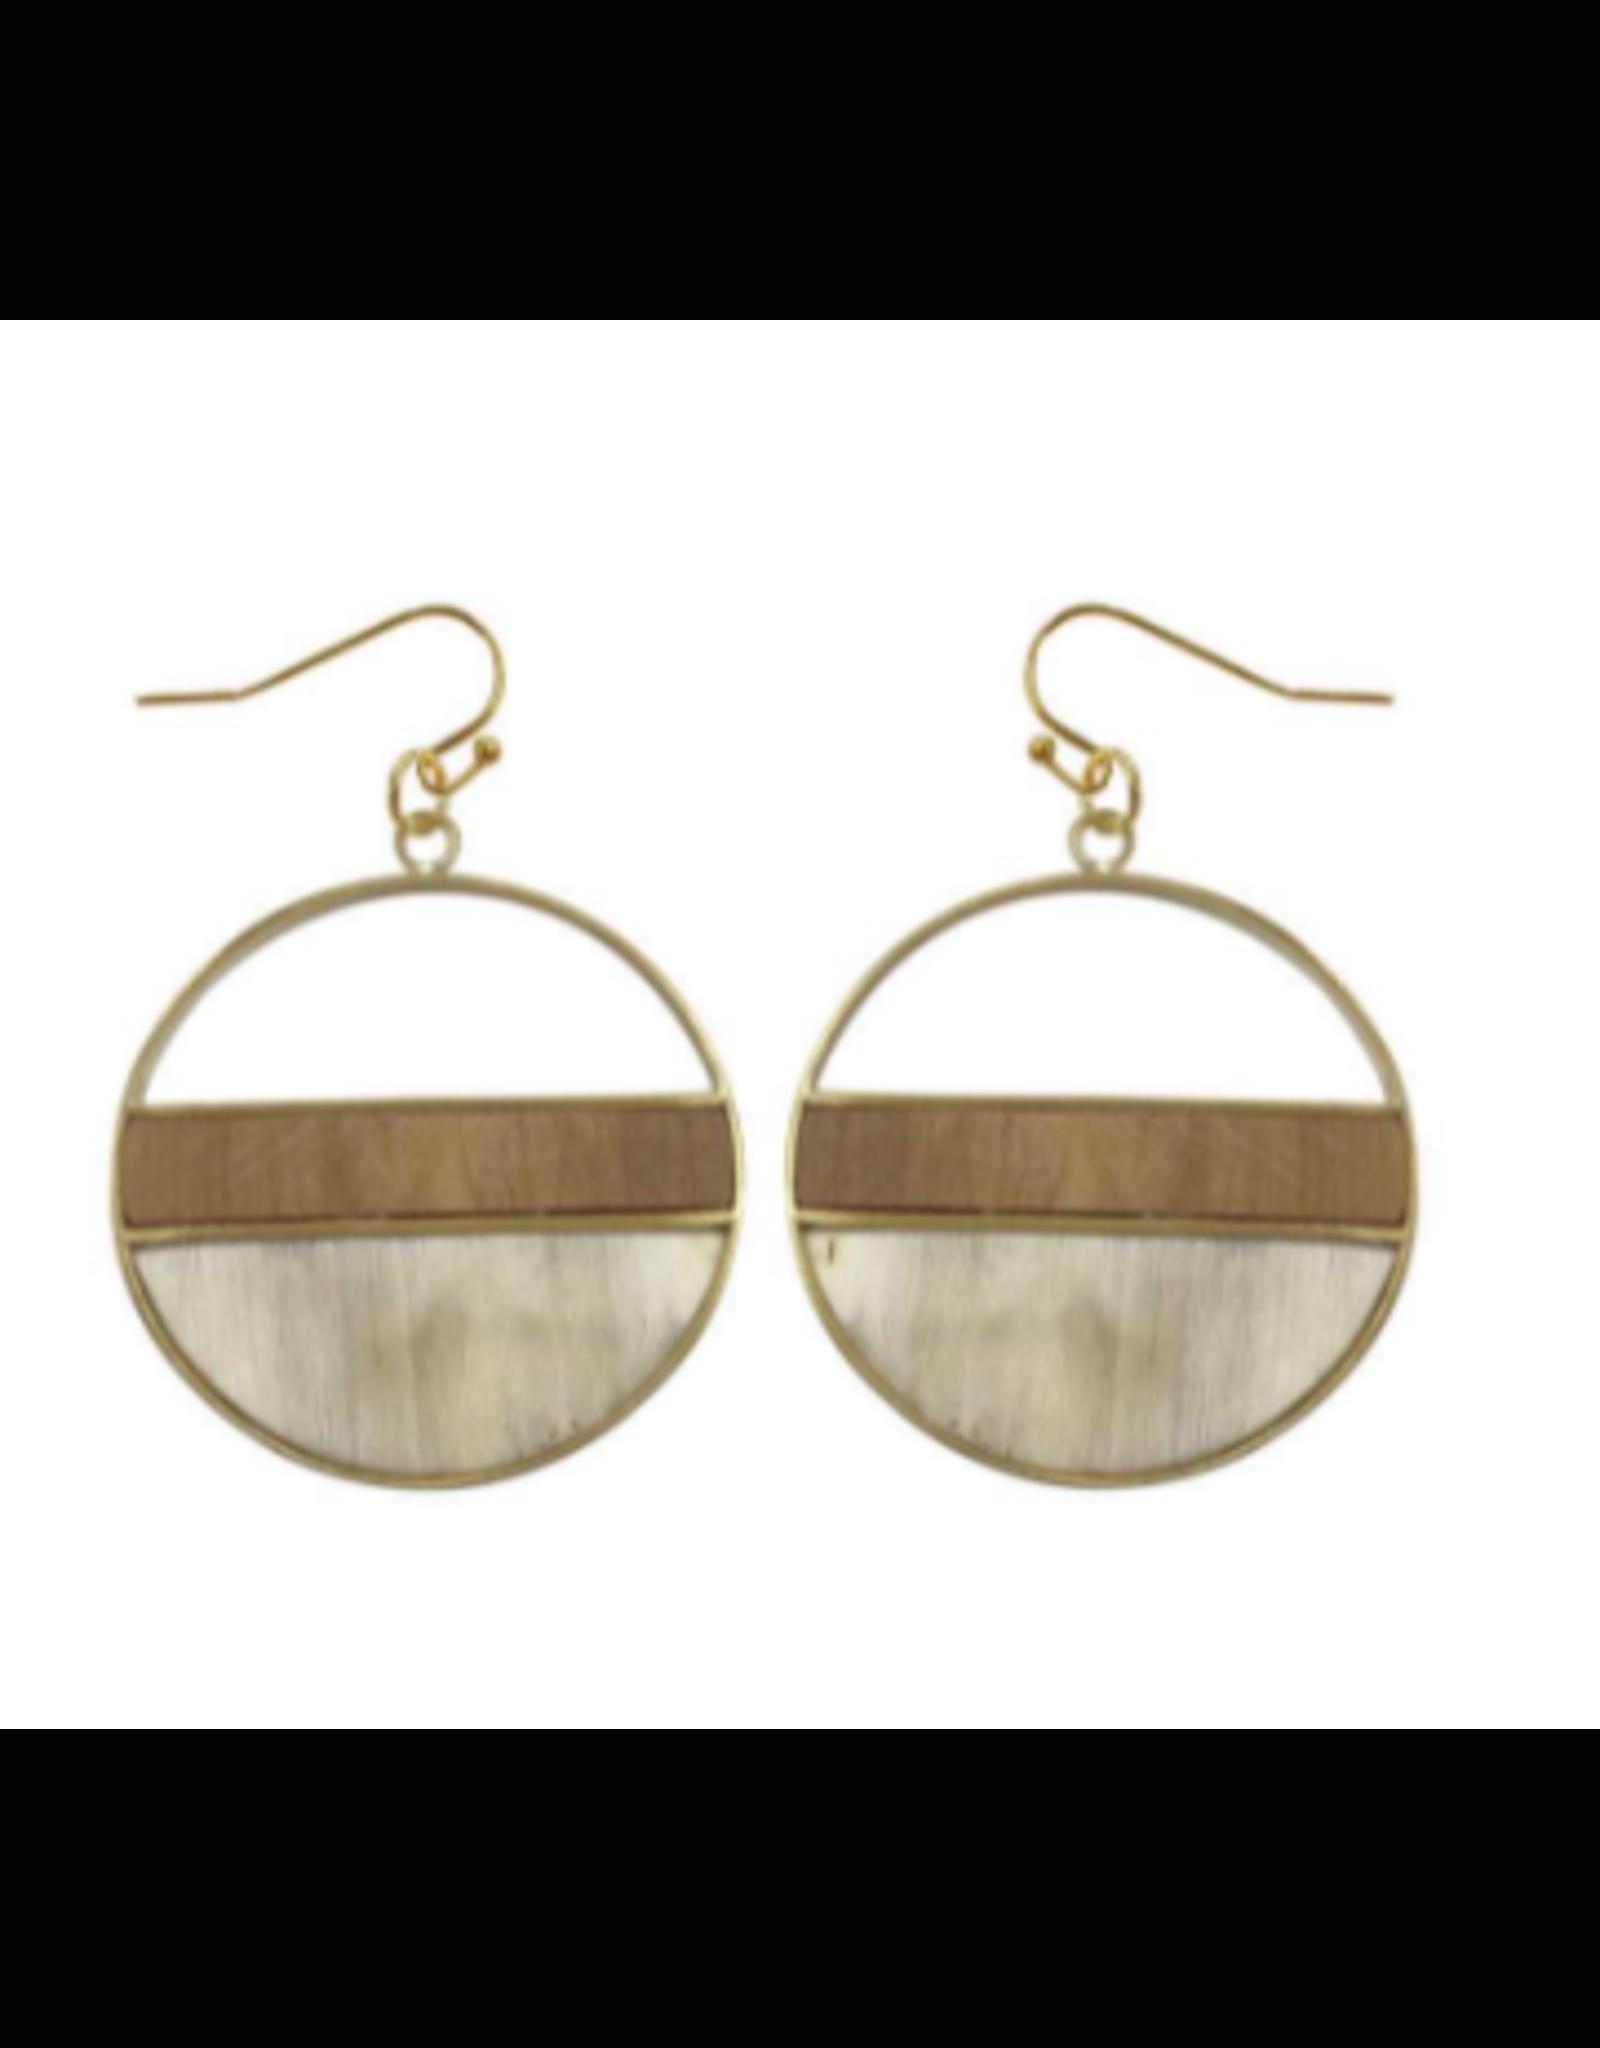 Emilia Geometric Upcycled Bullhorn Earrings, Vietnam